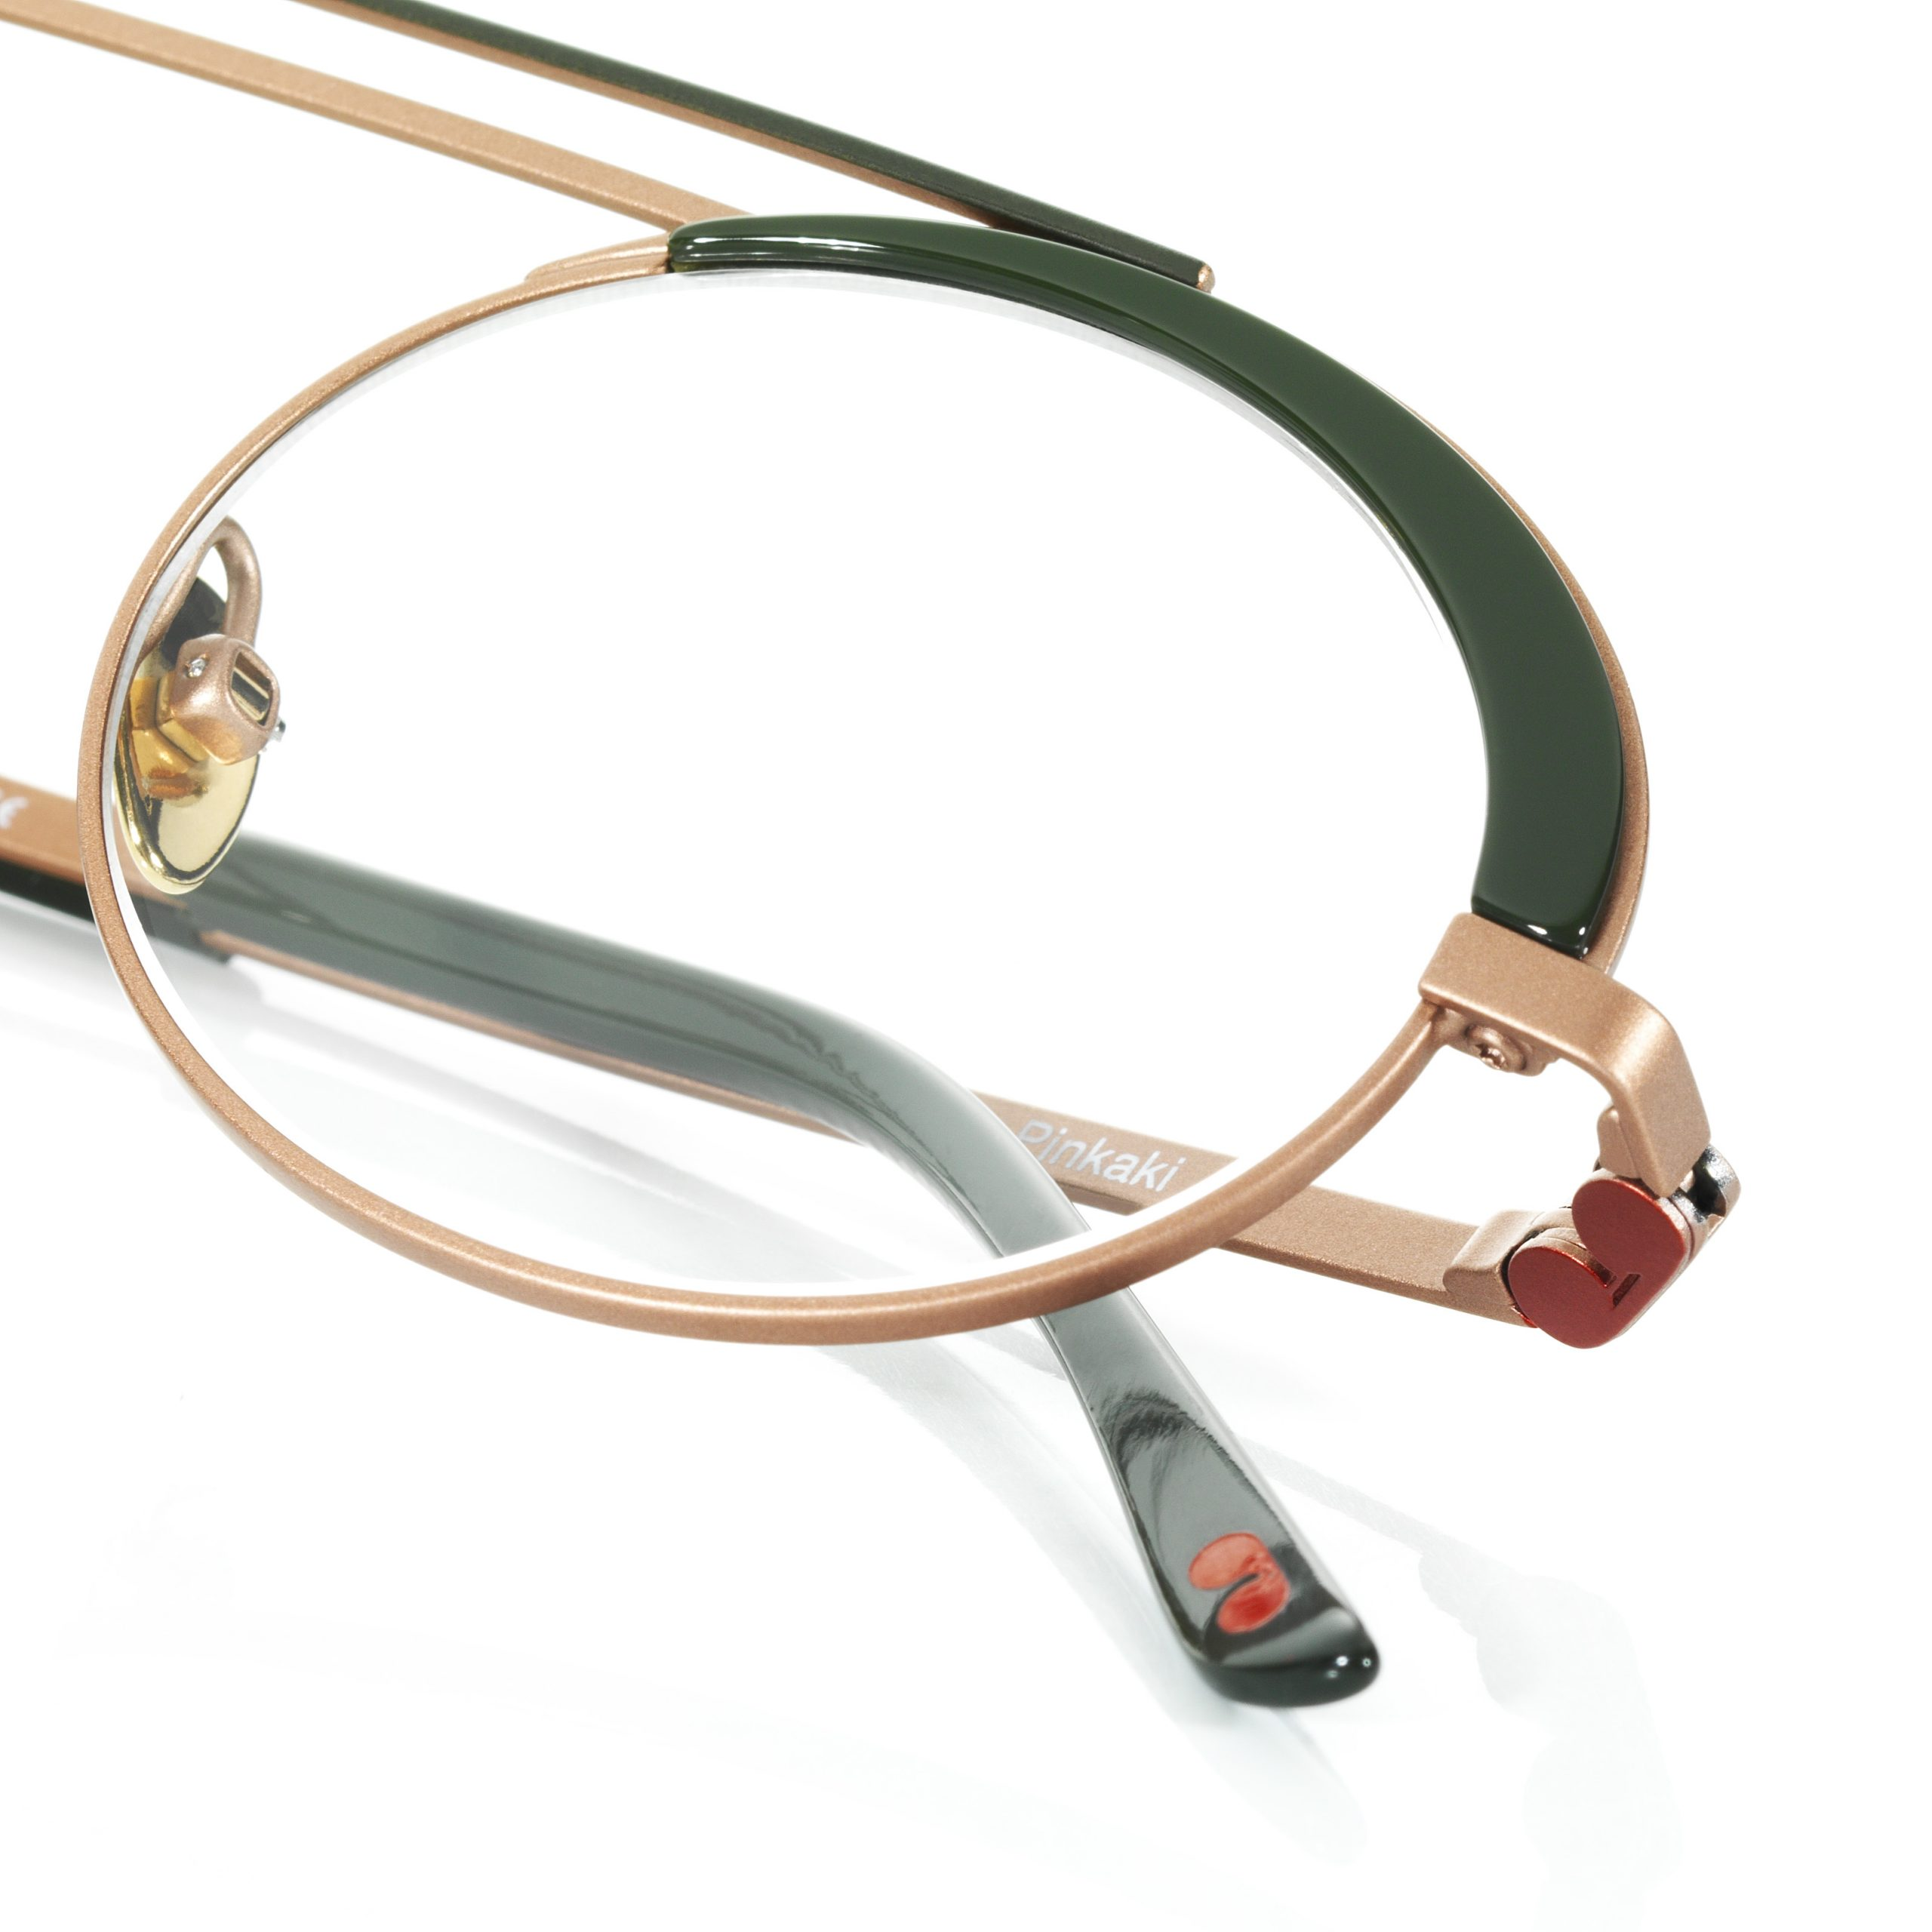 LPLR Eyewear - Official Store Grille Item